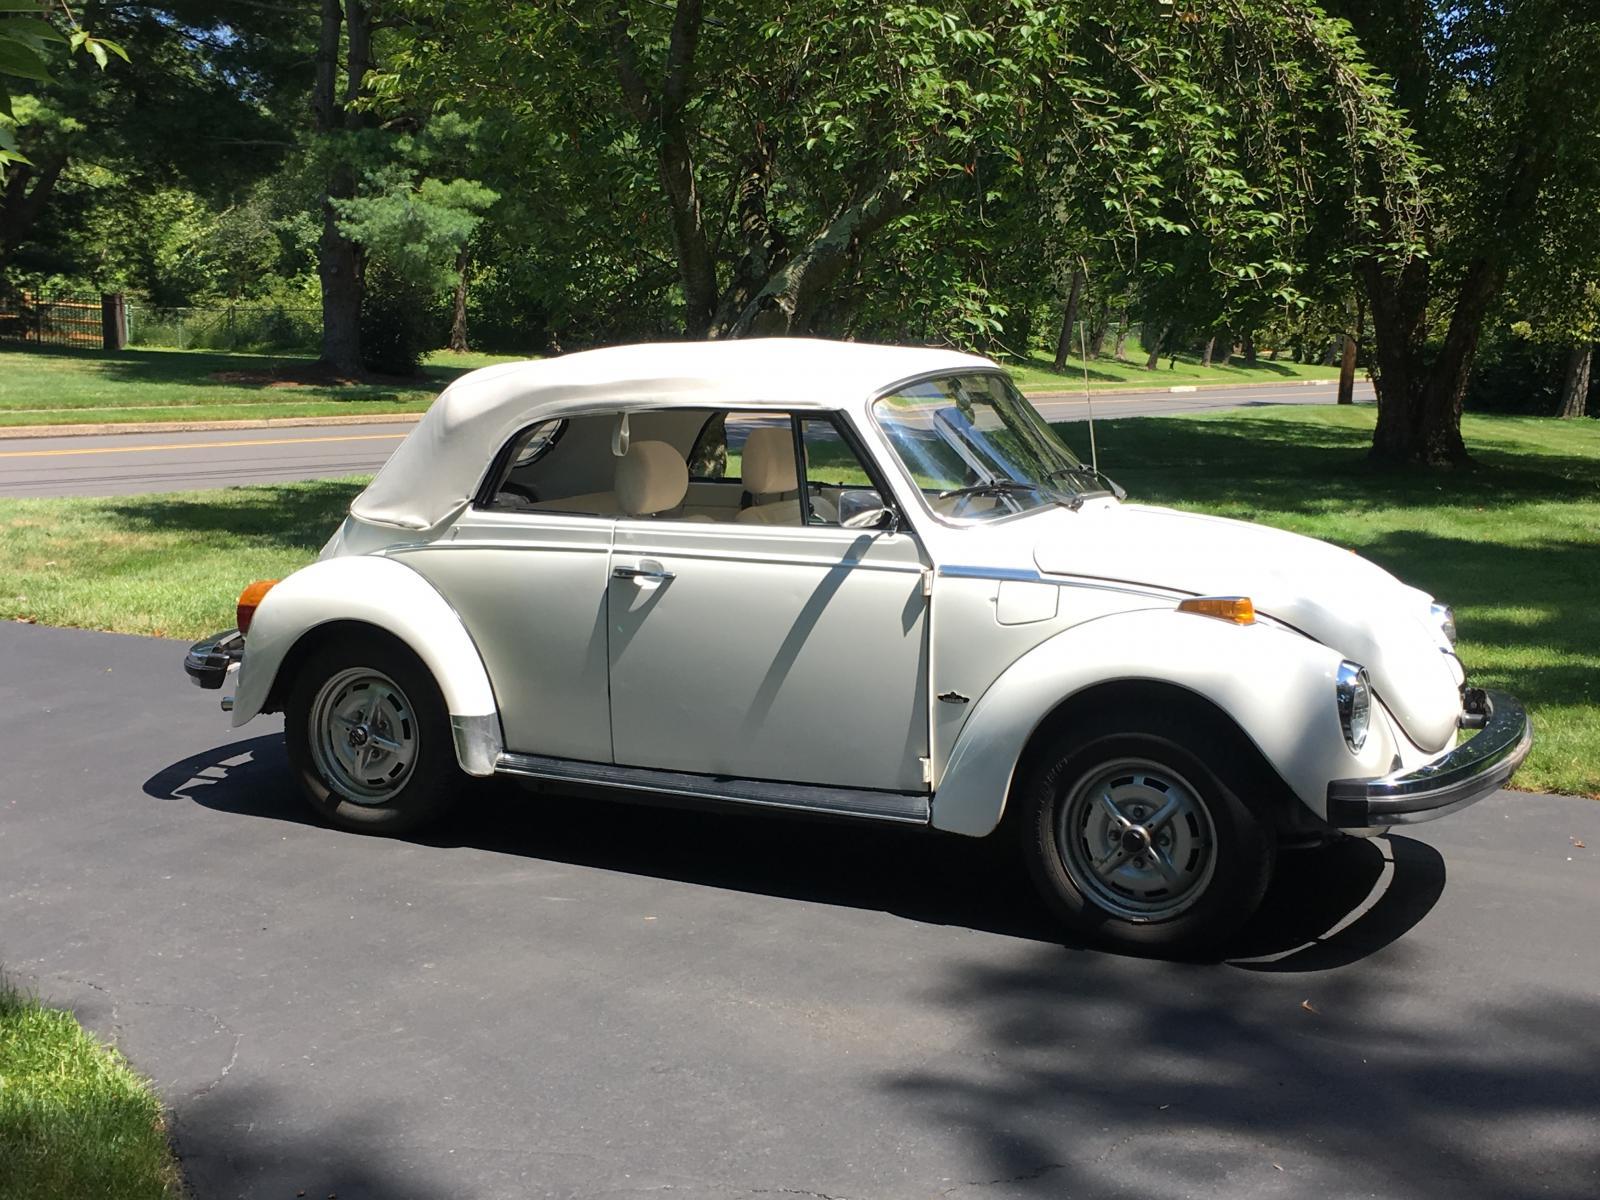 '79 Super Beetle triple white